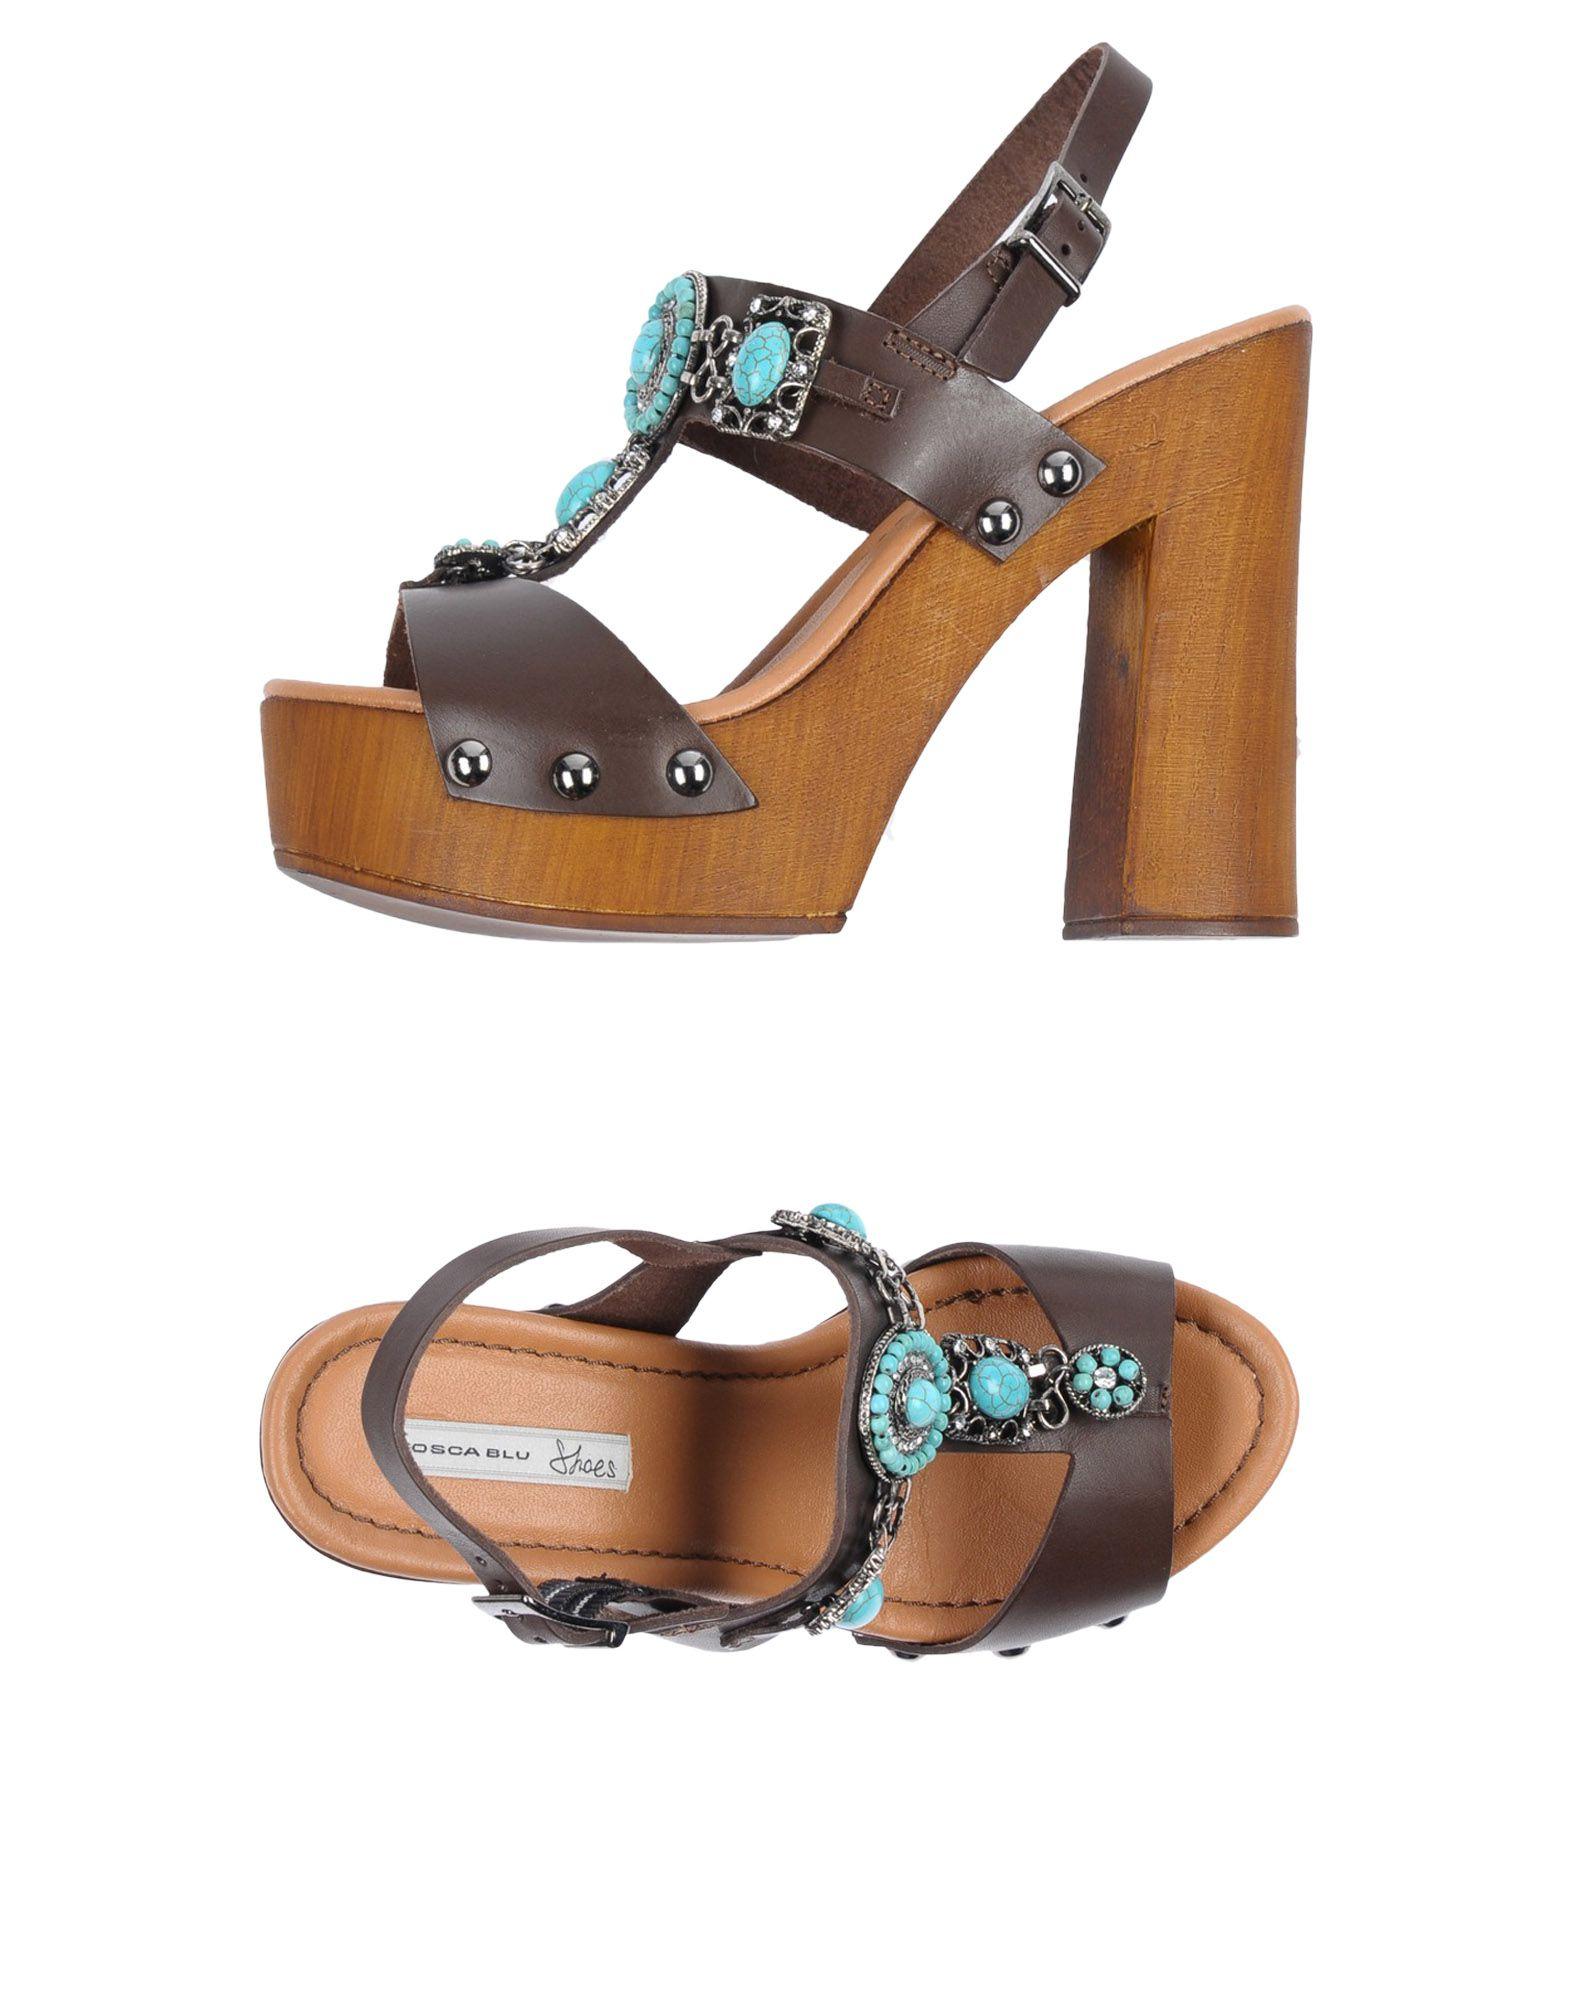 Tosca Tosca Tosca Blu Shoes Sandals - Women Tosca Blu Shoes Sandals online on  Canada - 11400339PG 2aff15